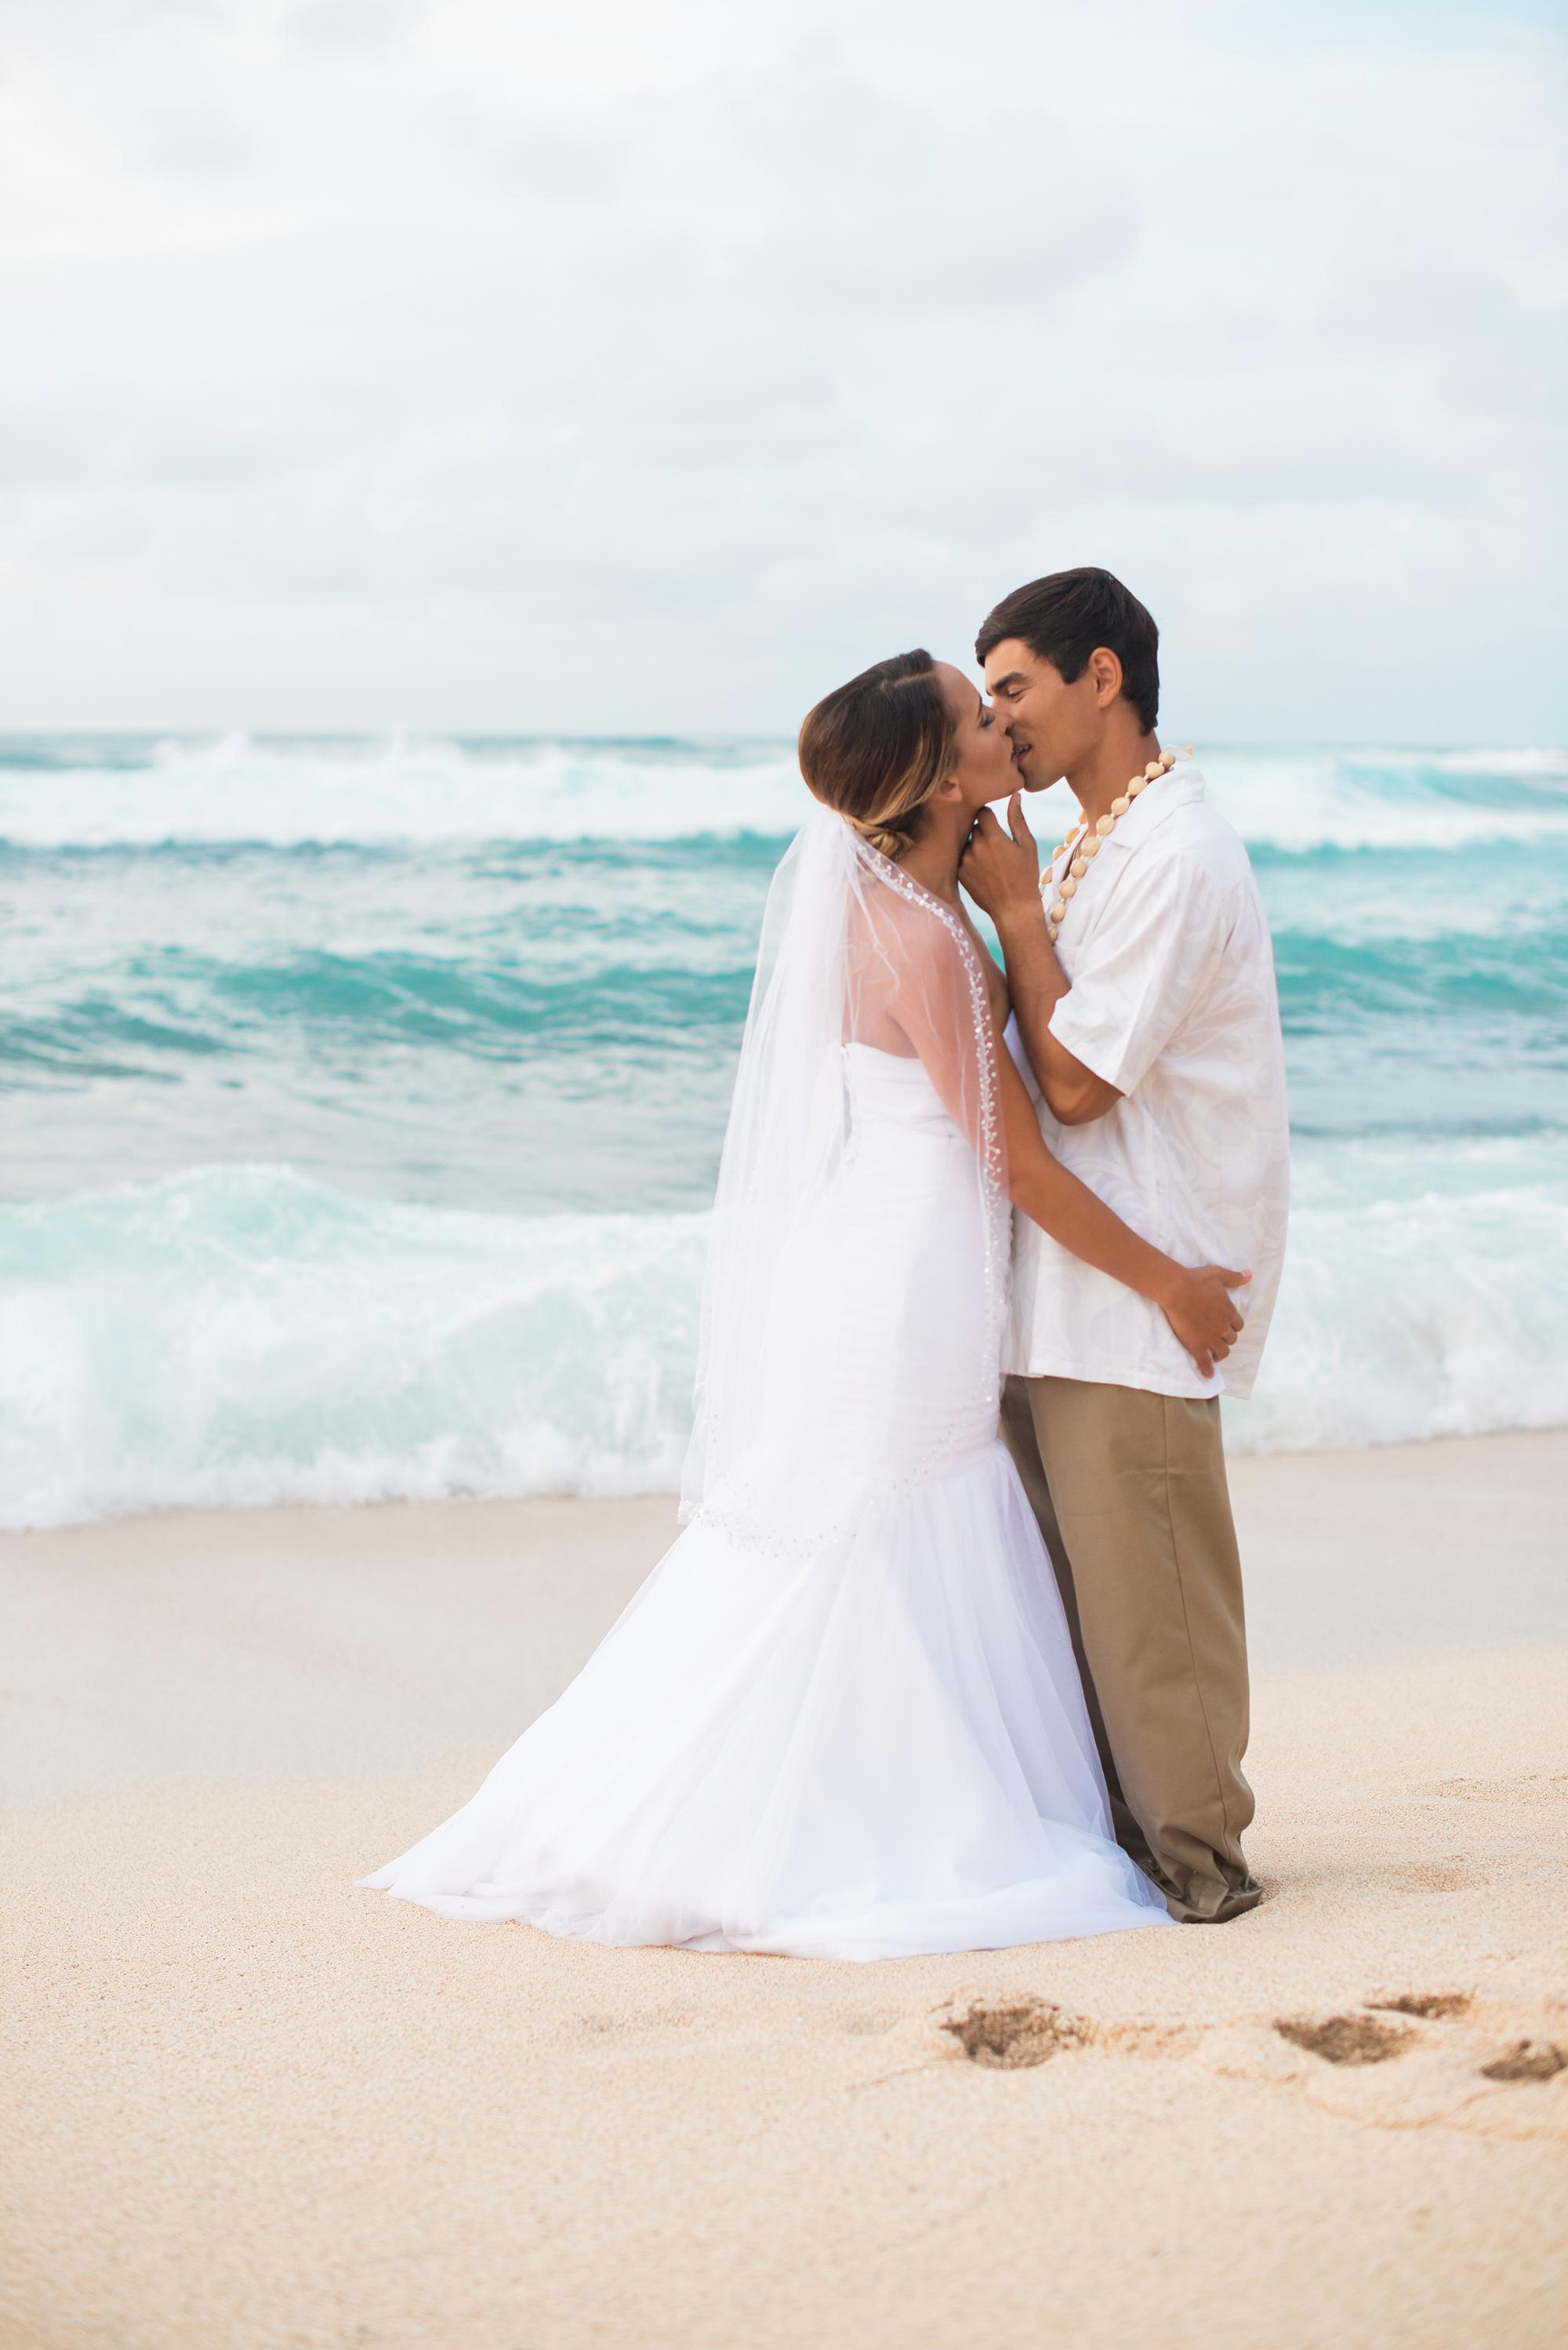 Hawaiian-Elopement-Marianne-Blackham-Photography-couple.jpg